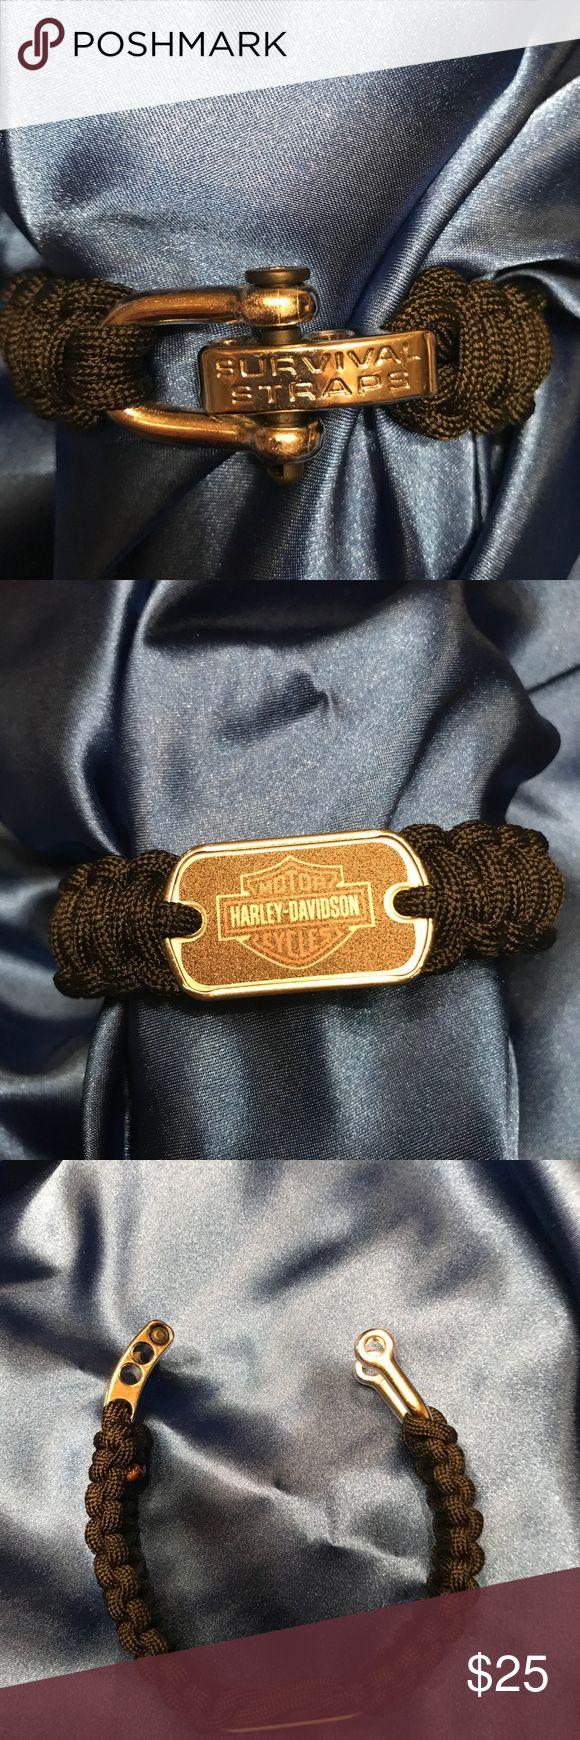 Harley Davidson Survival Strap Men's new Harley Davidson black survival strap bracelet Harley-Davidson Accessories Jewelry